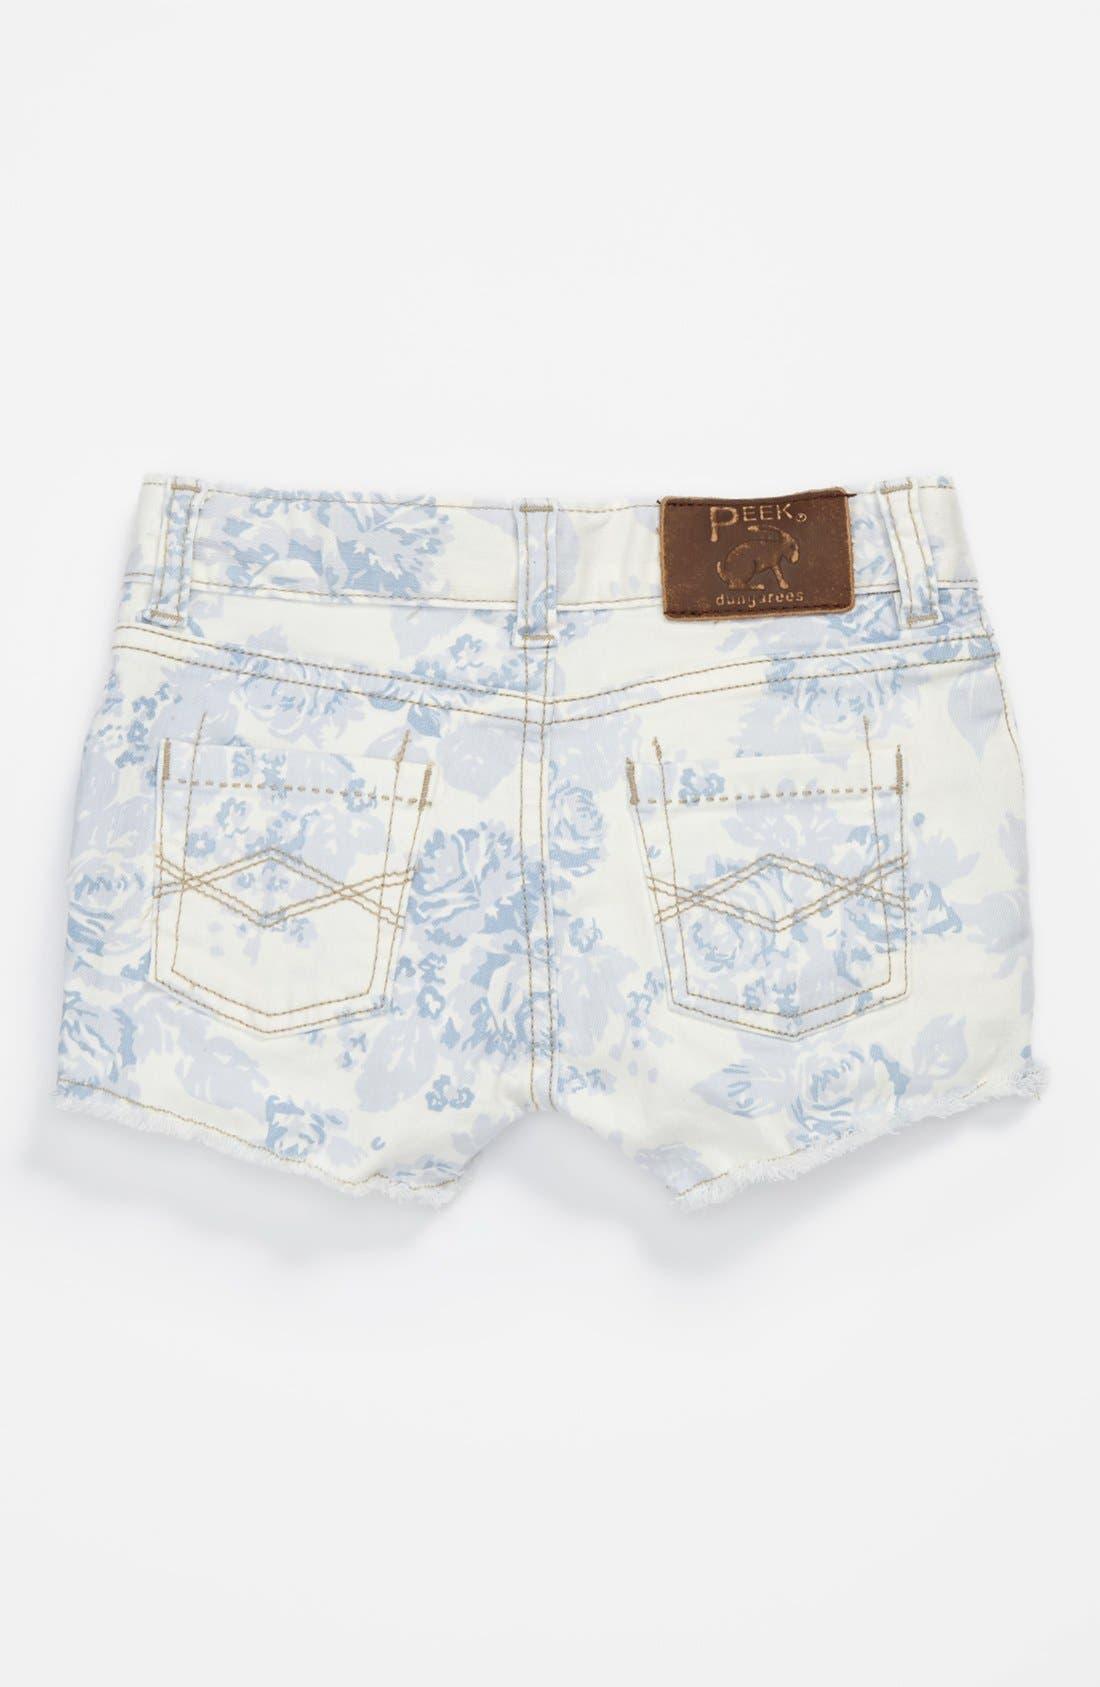 Main Image - Peek 'New Morgan' Denim Shorts (Big Girls)